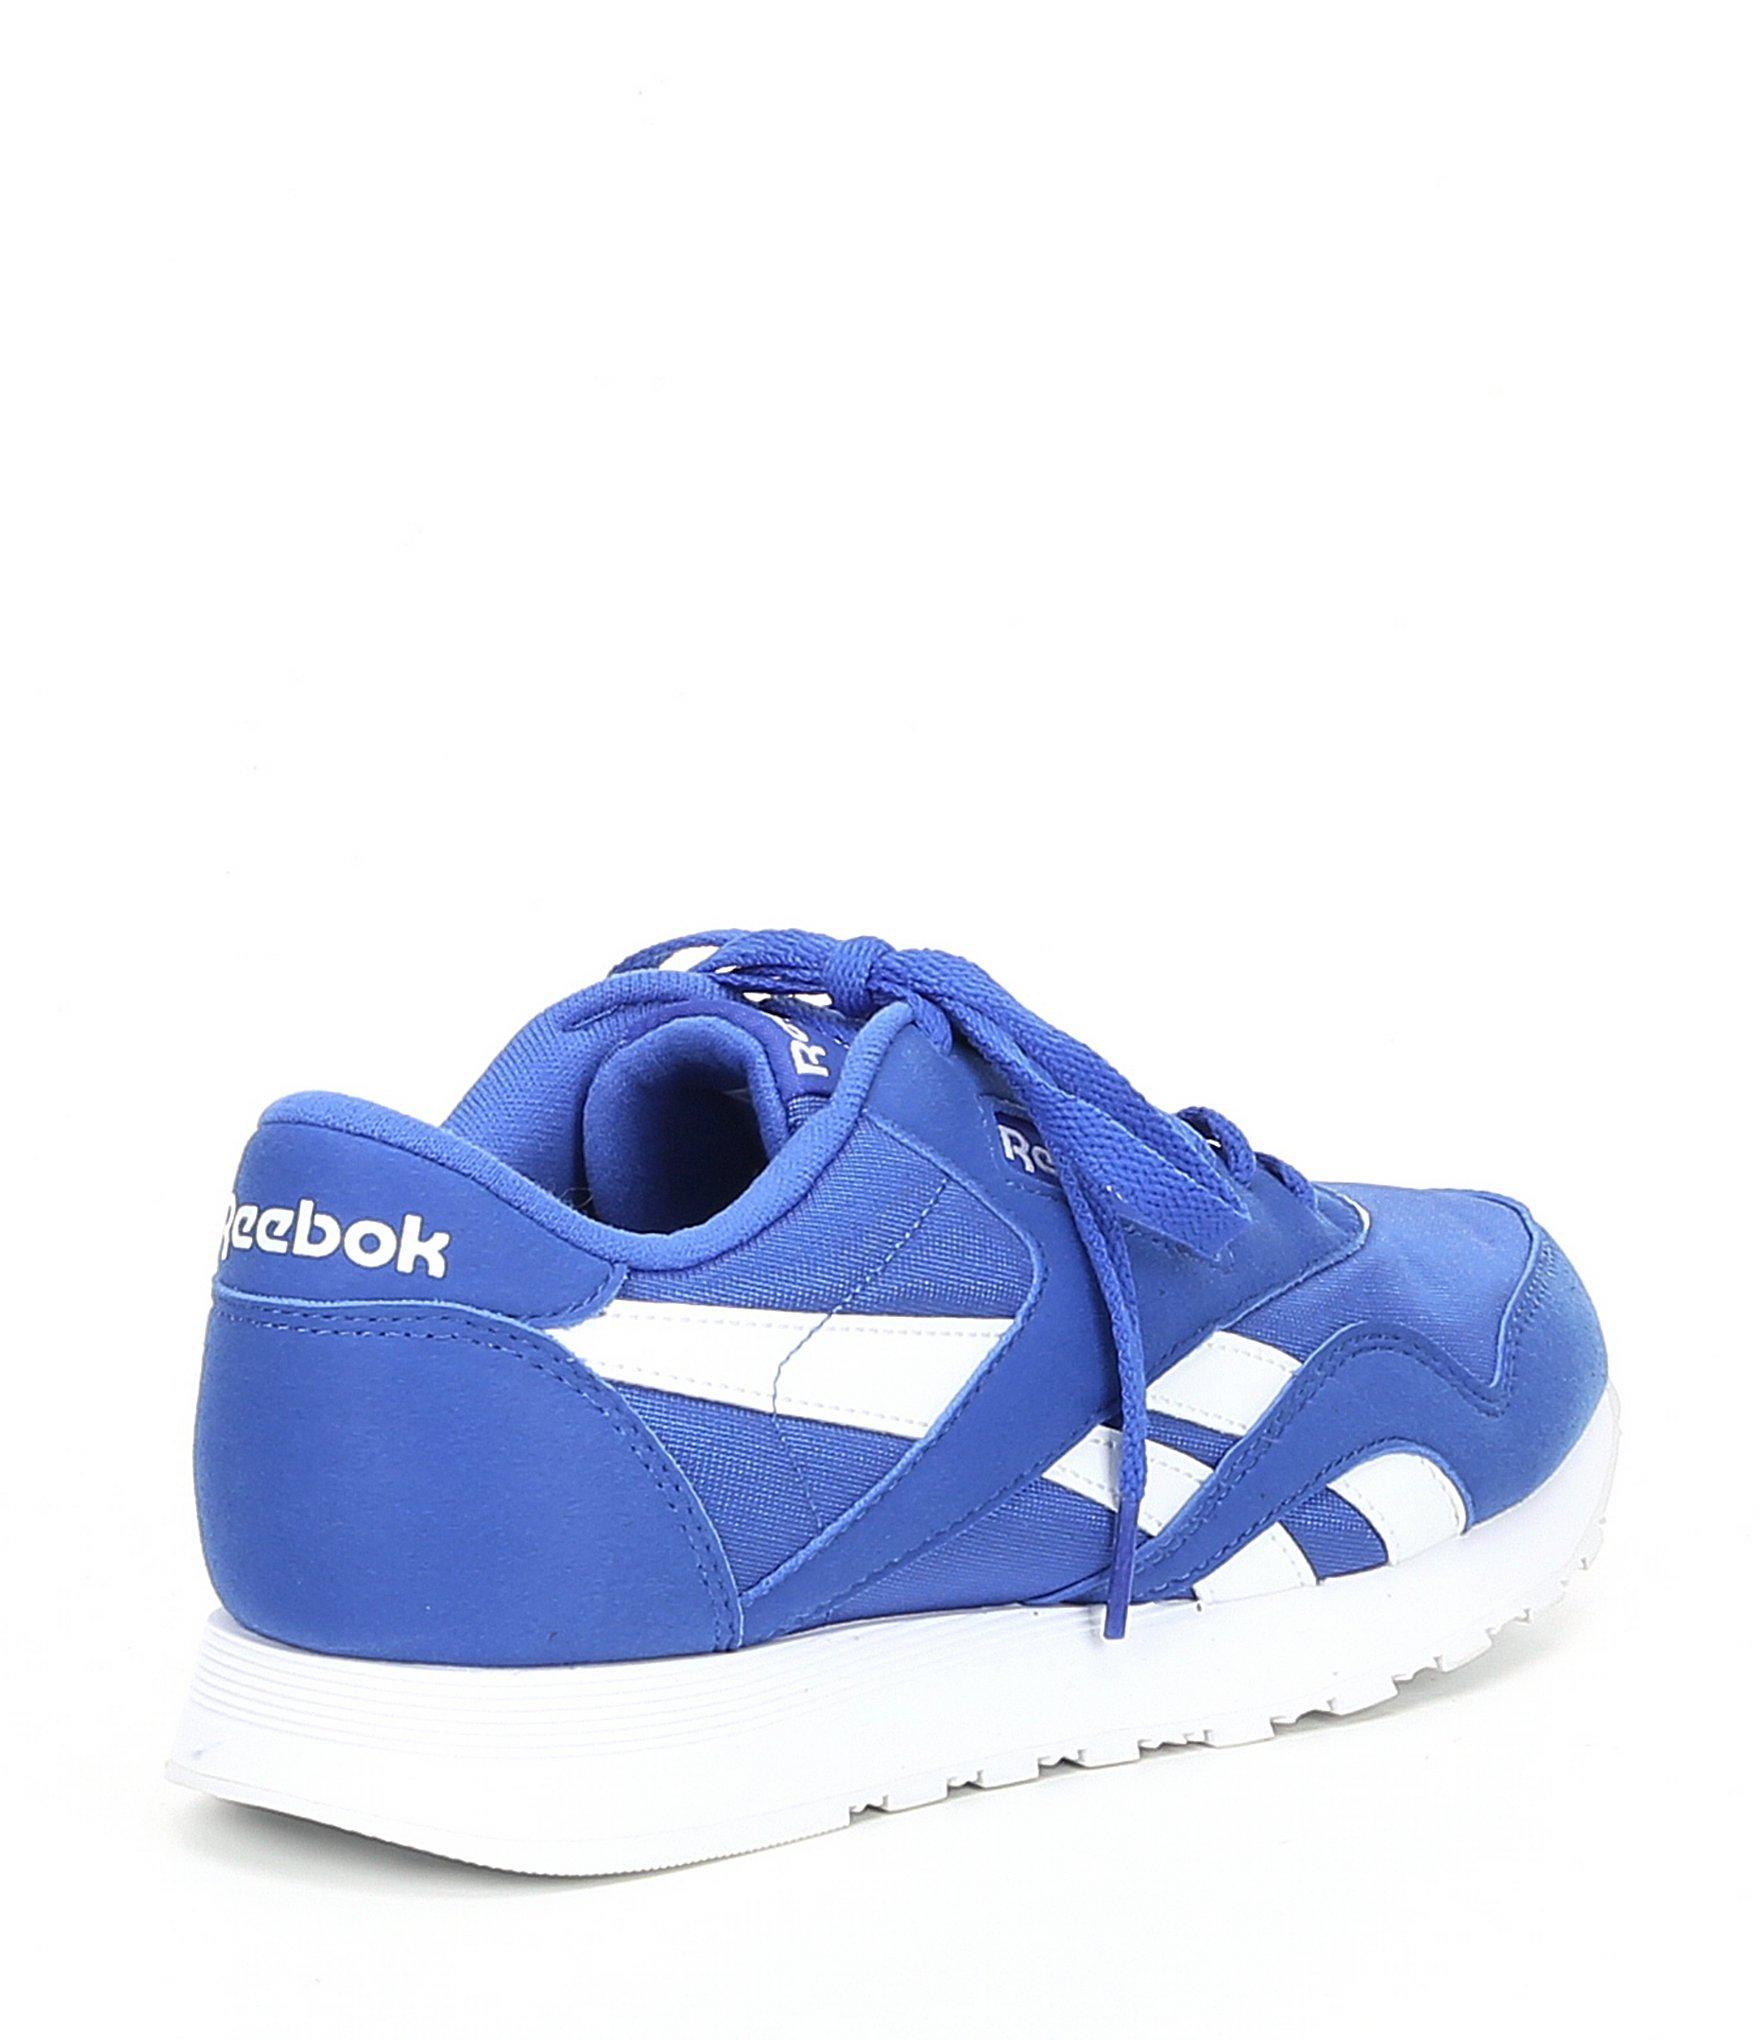 a4b85914cfae Reebok - Blue Women s Classic Nylon Sneaker - Lyst. View fullscreen